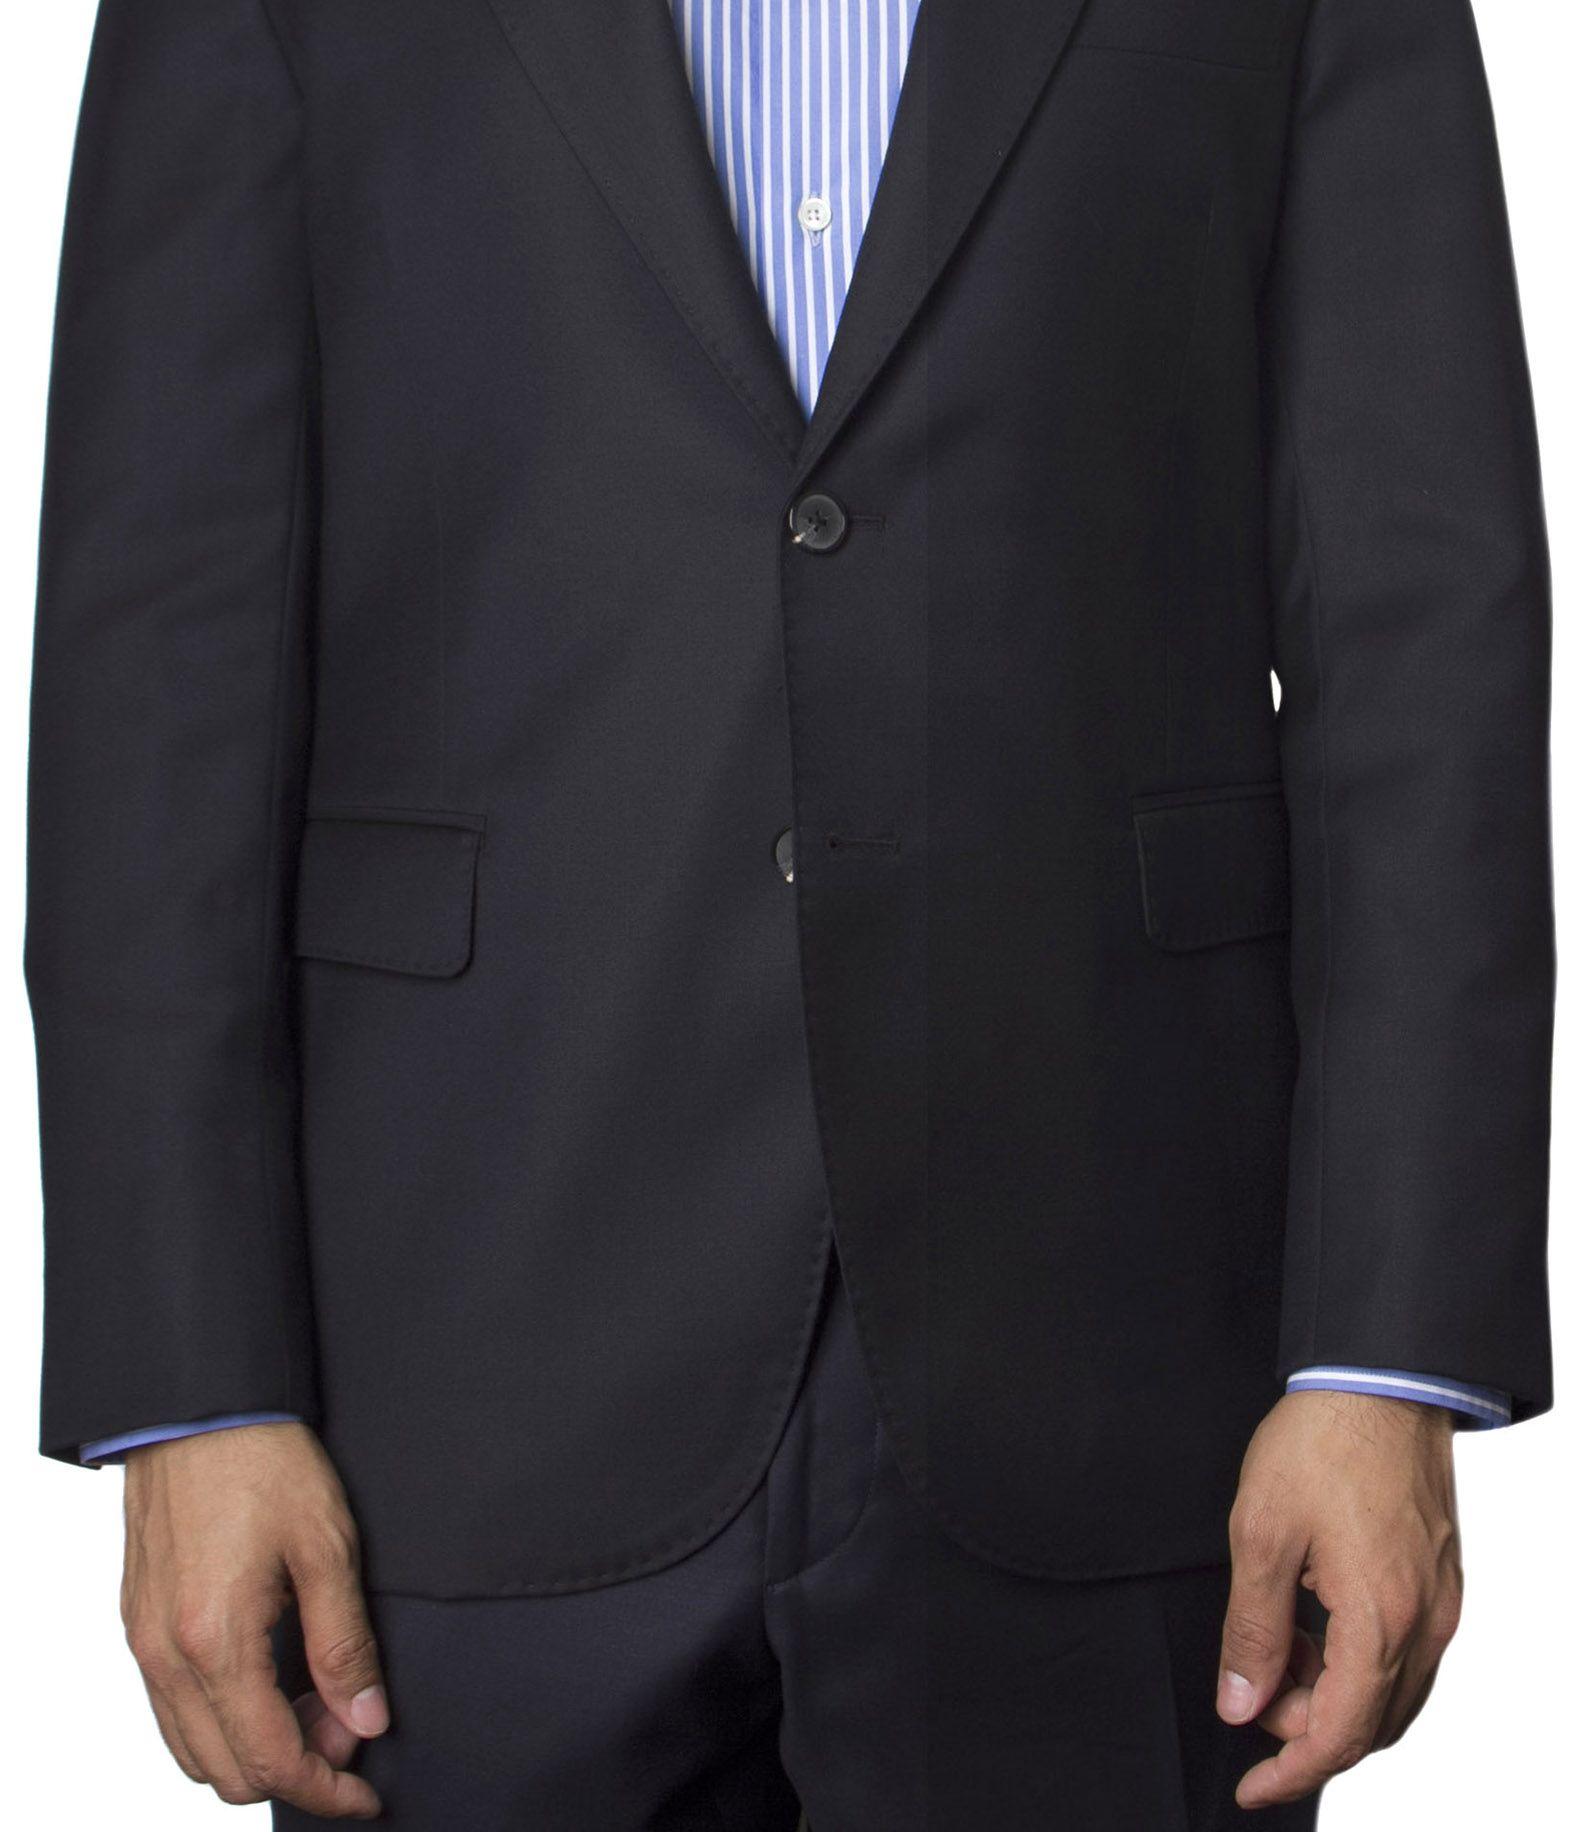 Jacket Length Ideal